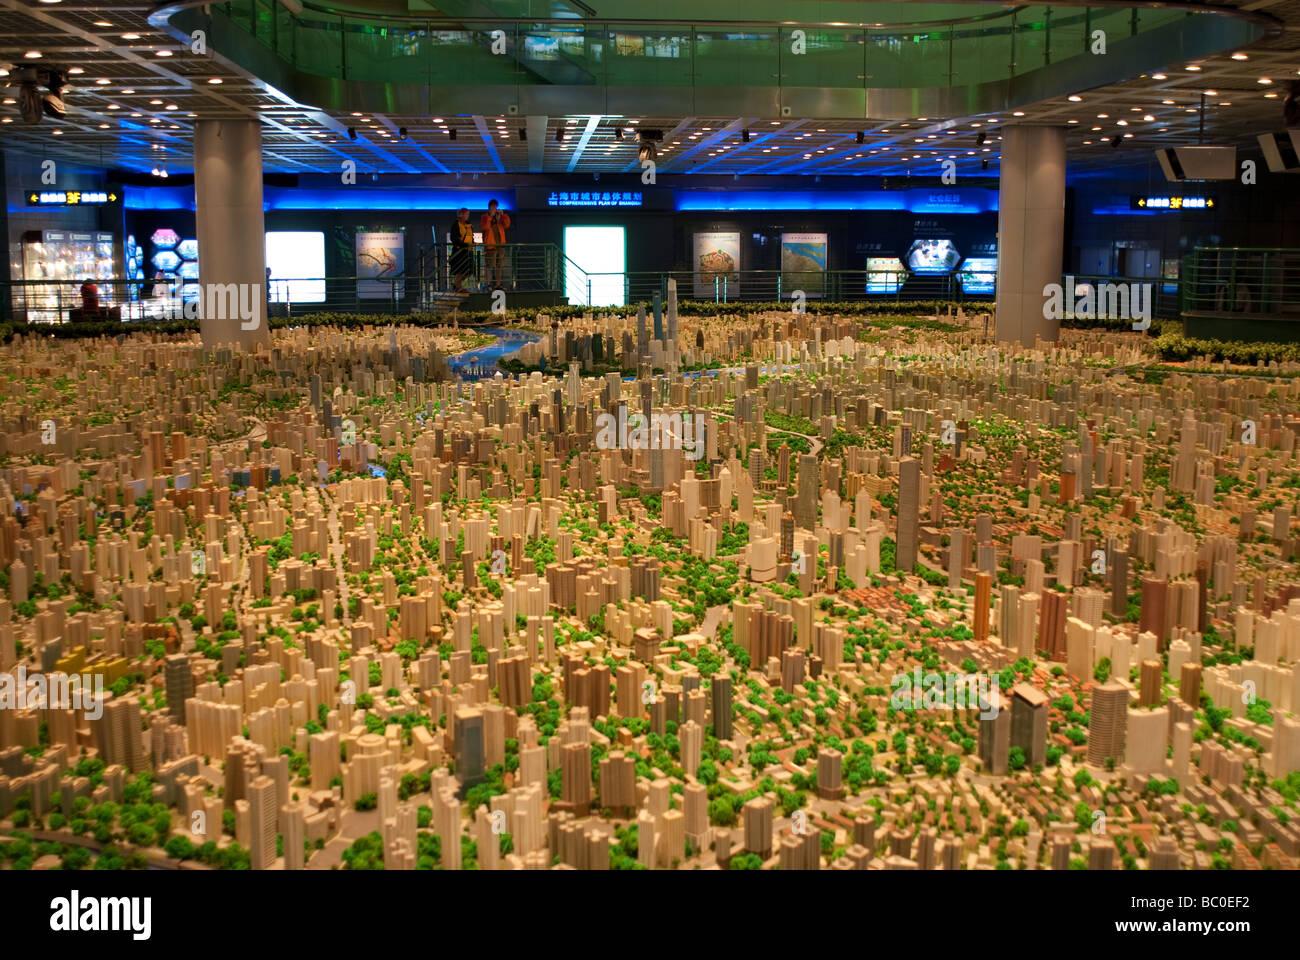 Illuminated scale plan of Shanghai for World Expo 2010 Shanghai Urban Planning Exhibition Hall China Stock Photo